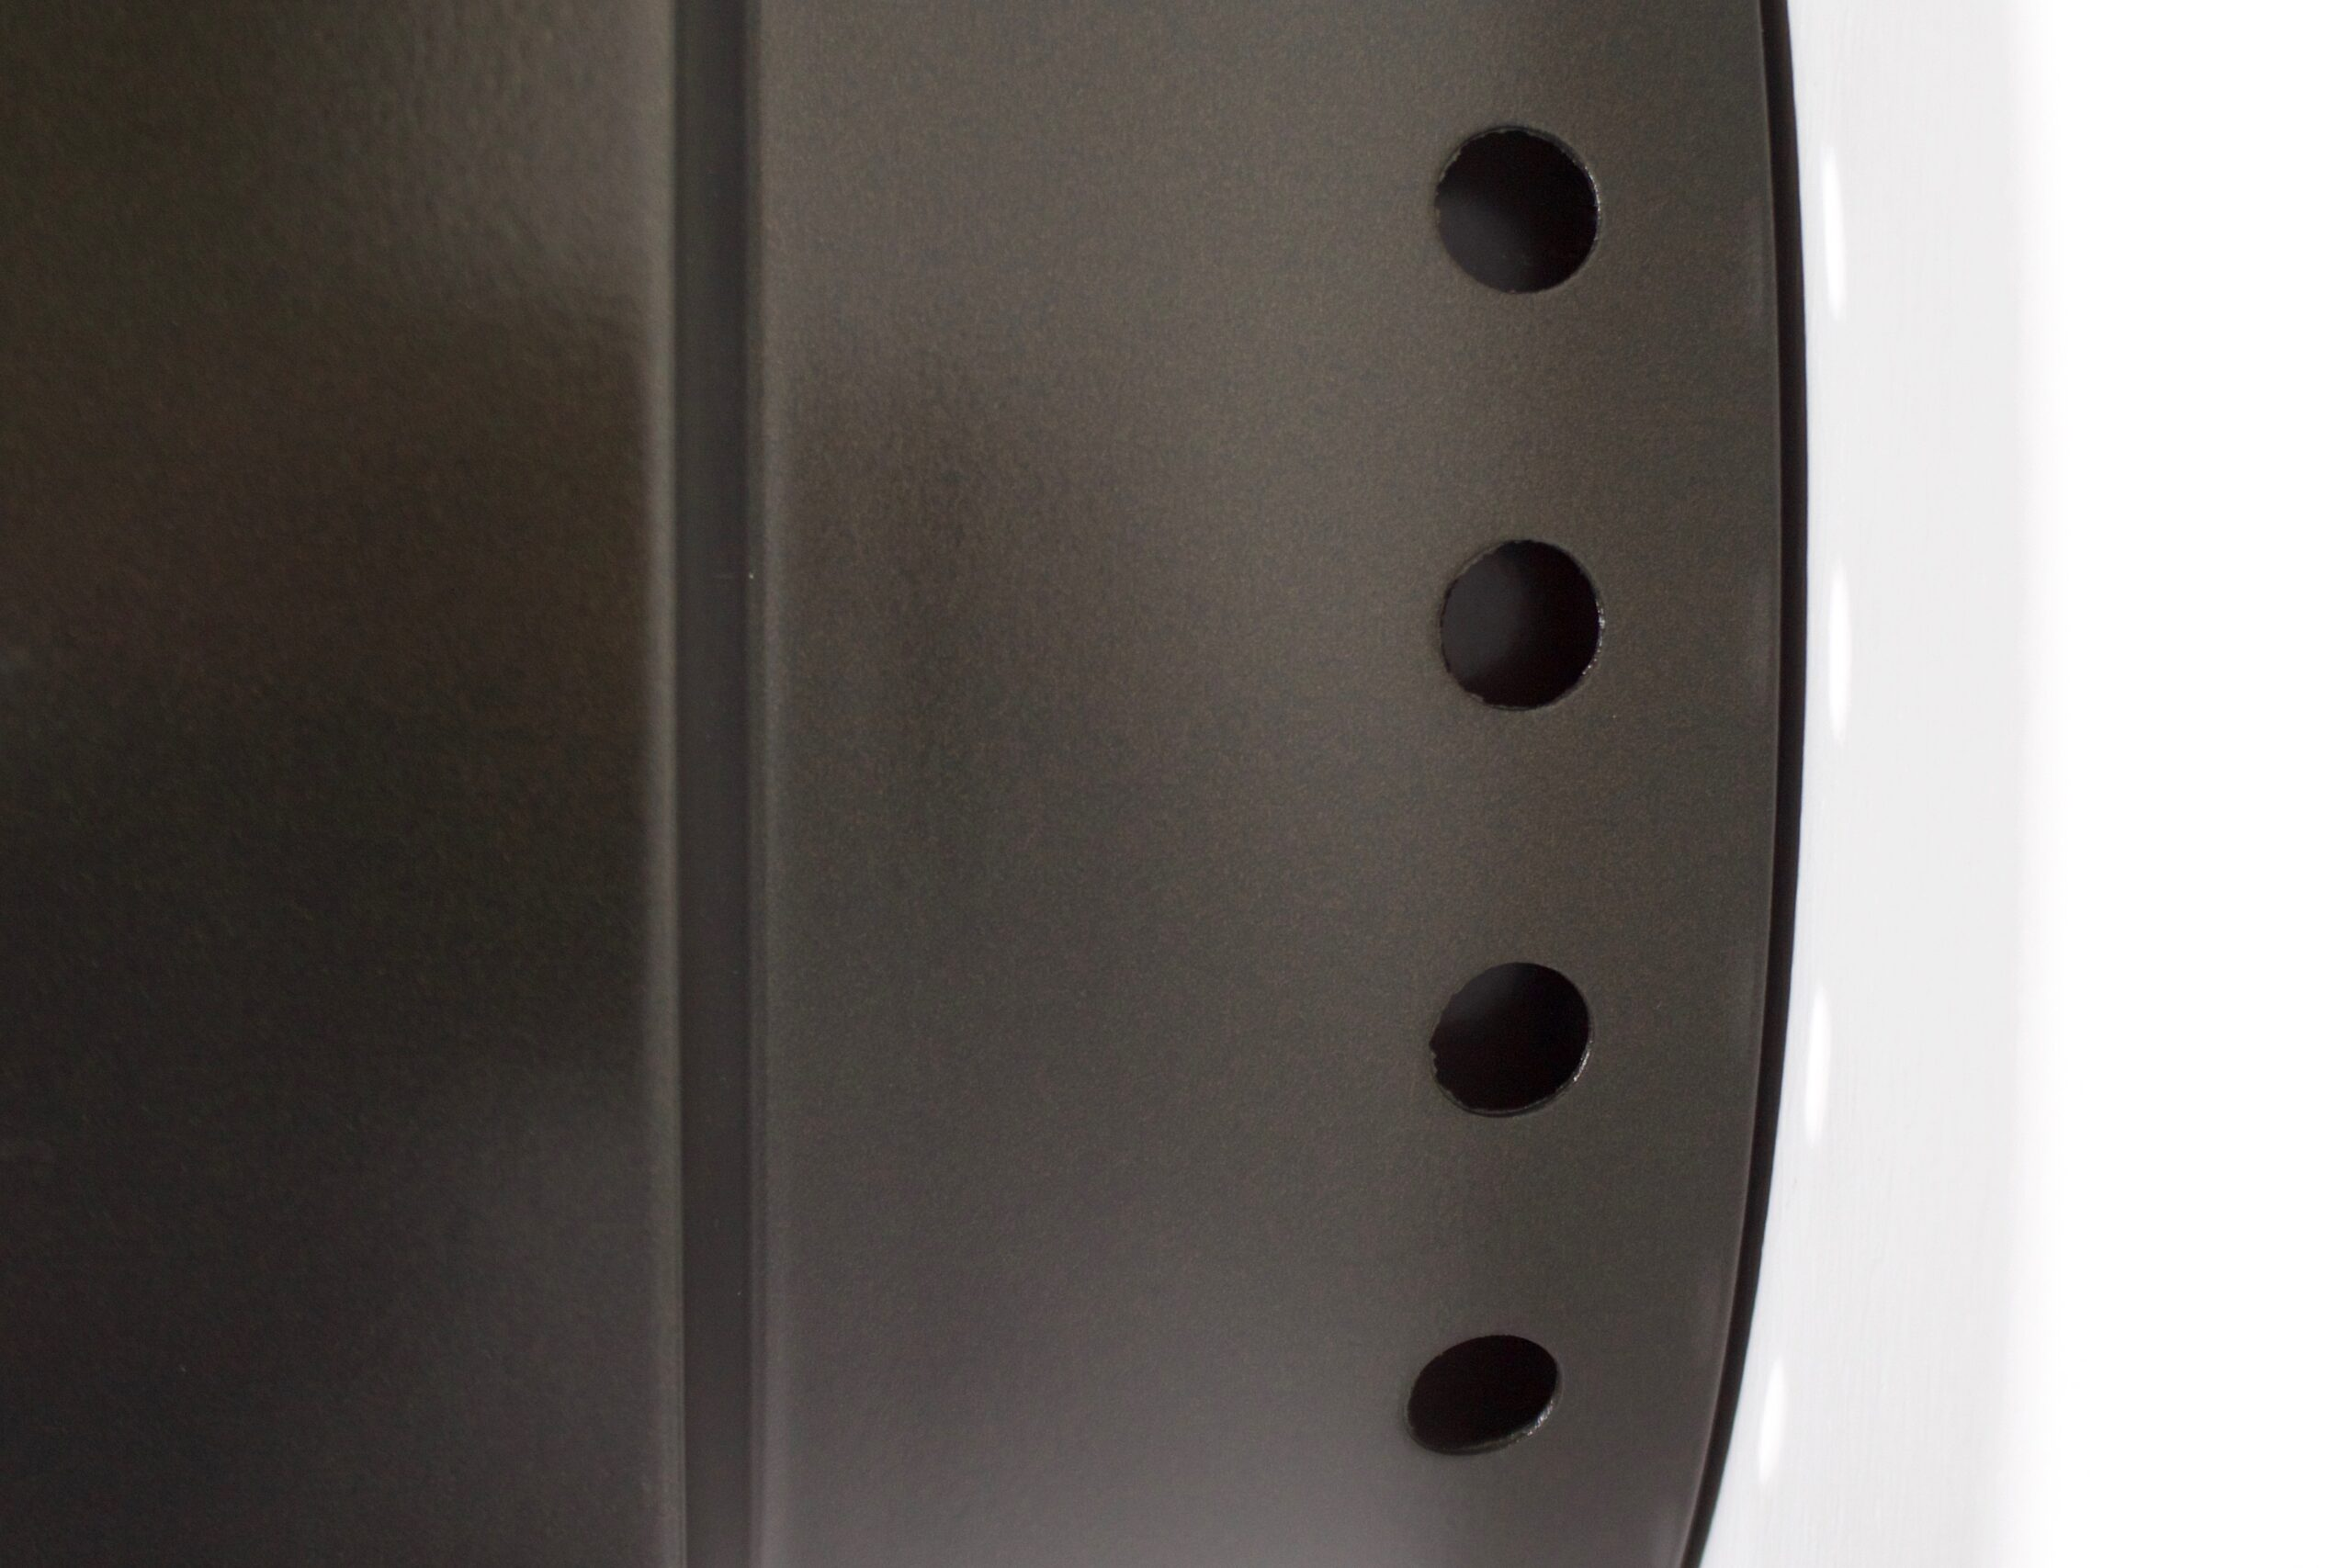 Gino Sarfatti 3009 Flushmounts Produced by Arteluce